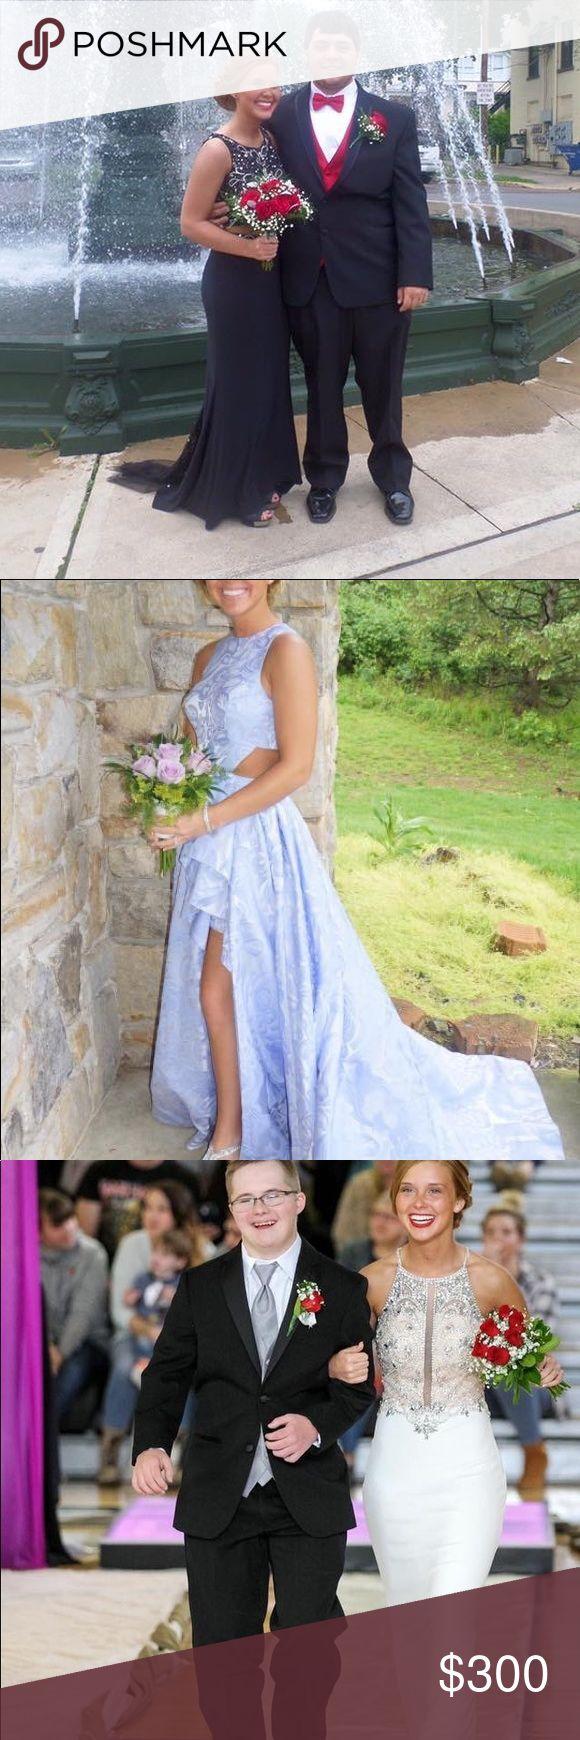 Name Brand prom dresses 3 beautiful name brand prom dresses. in perfect condition. Dresses Prom